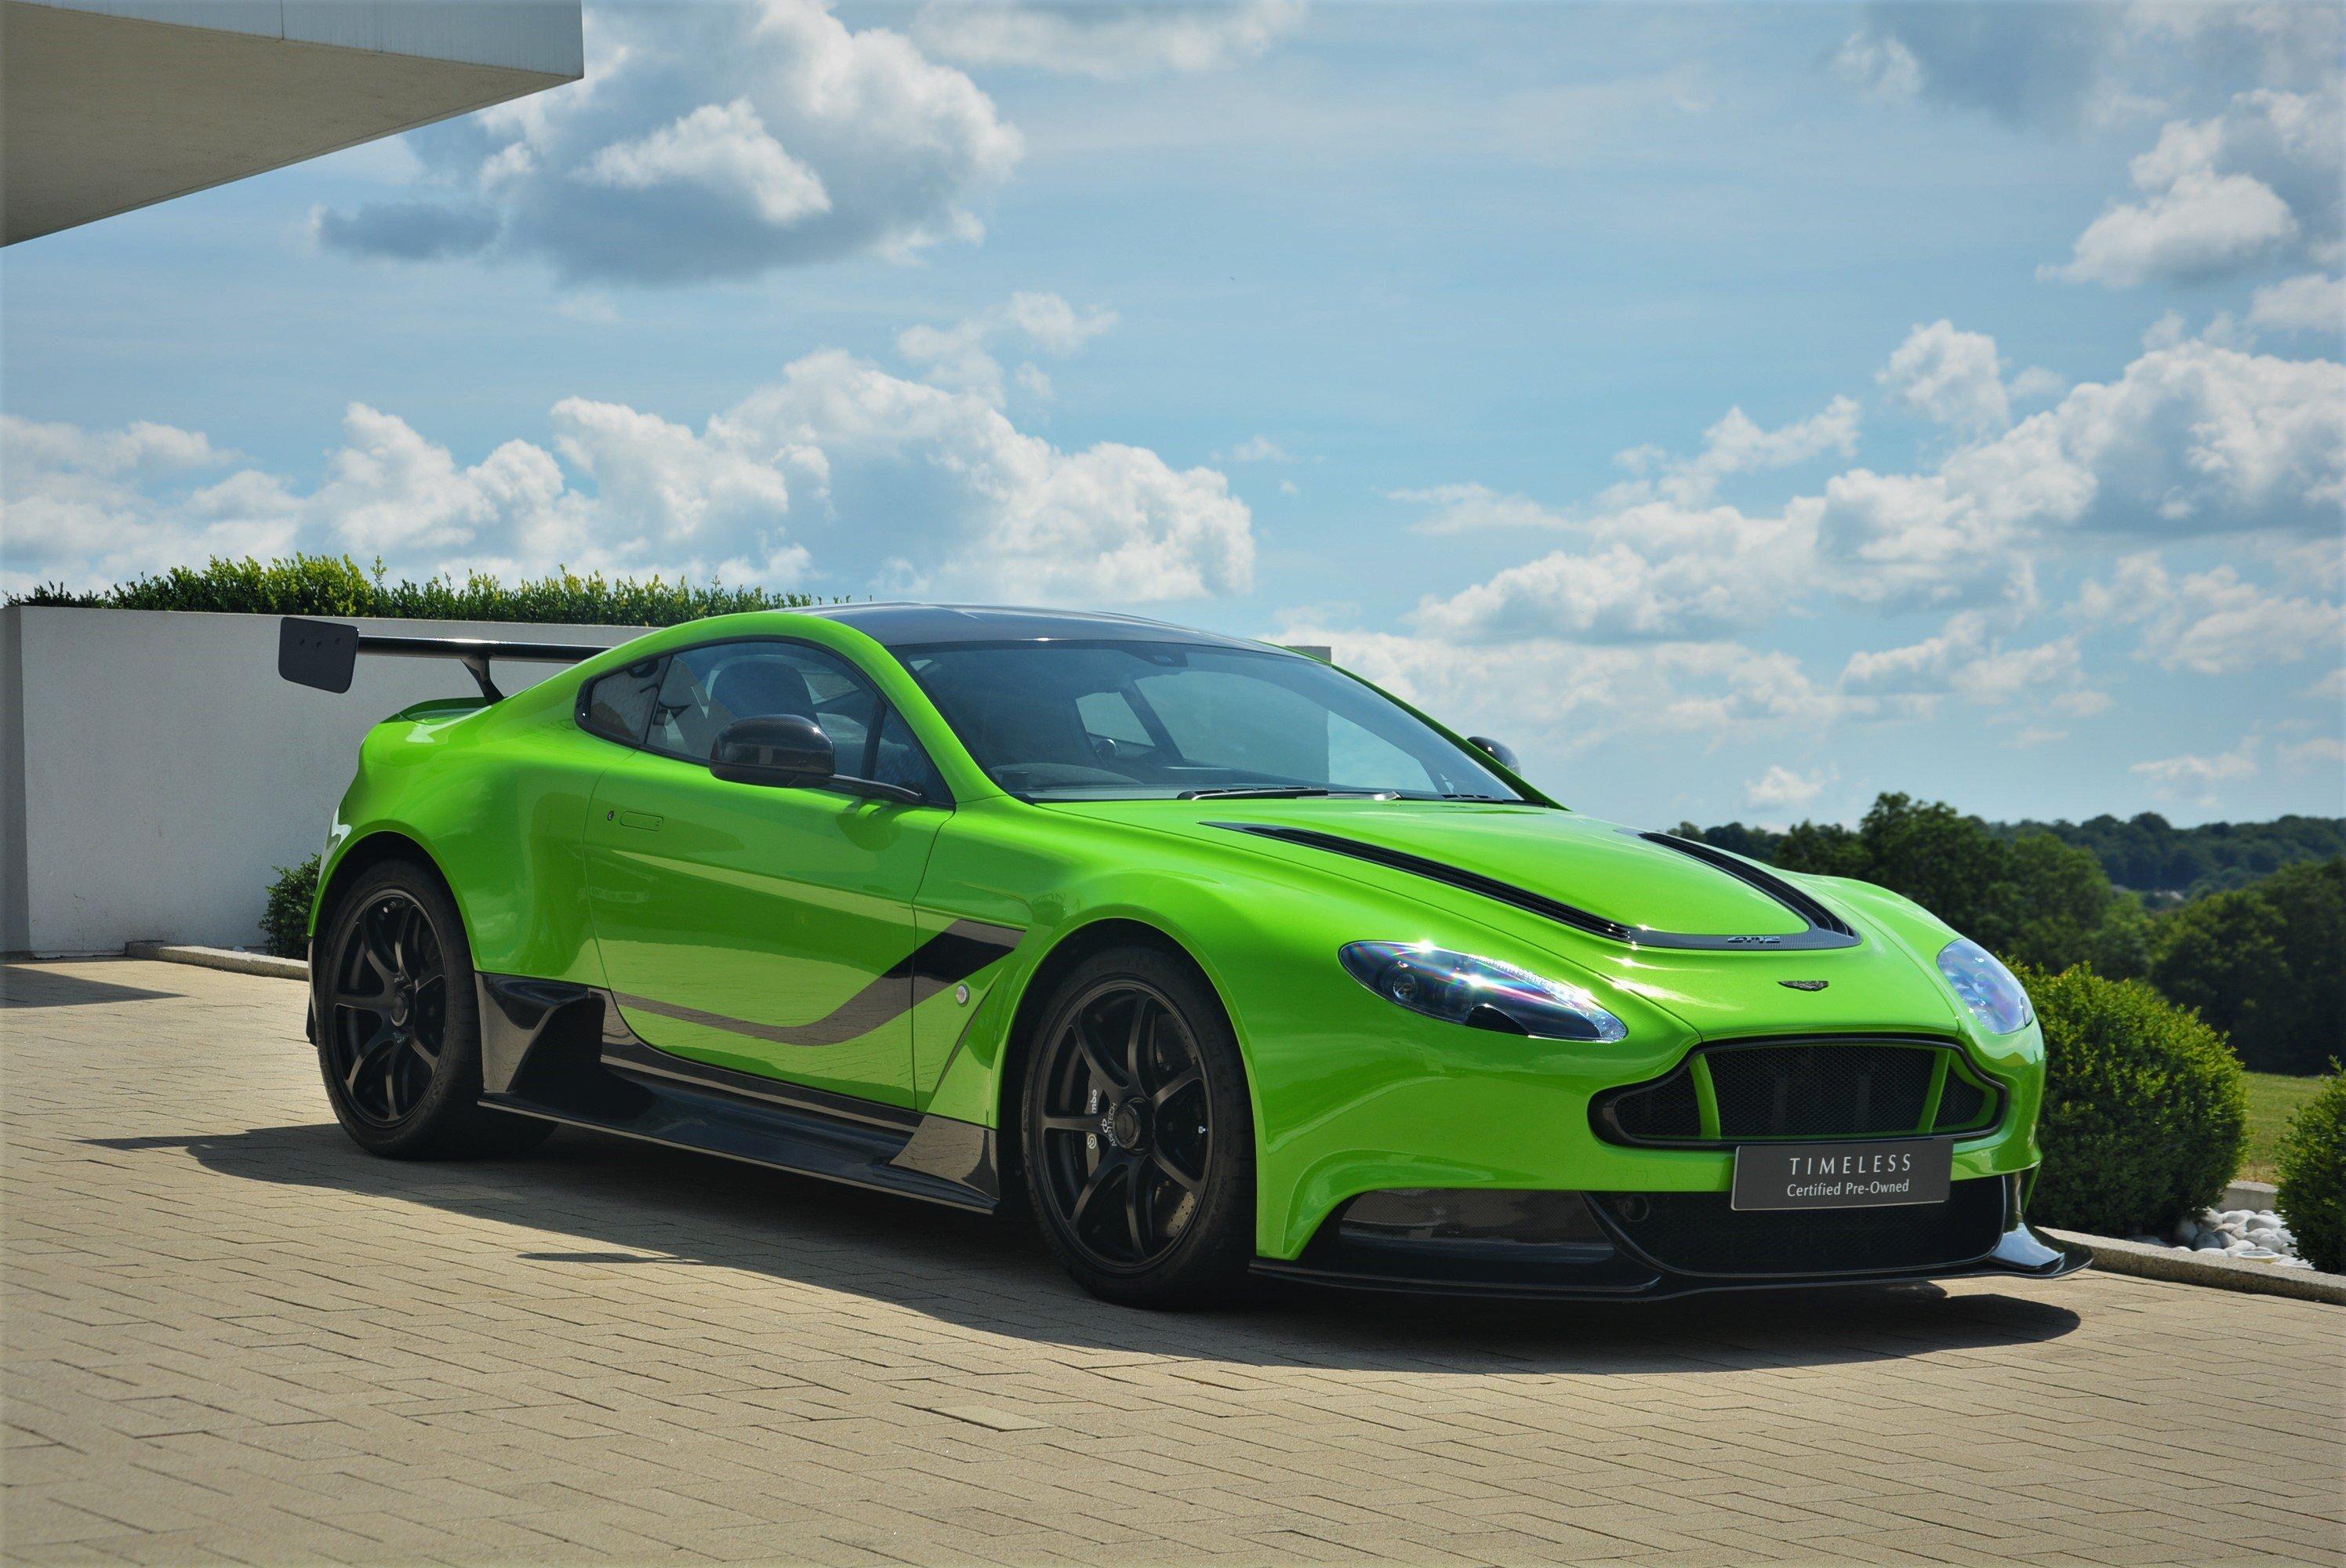 2016 Aston Martin Vantage Gt12 Gt12 Classic Driver Market